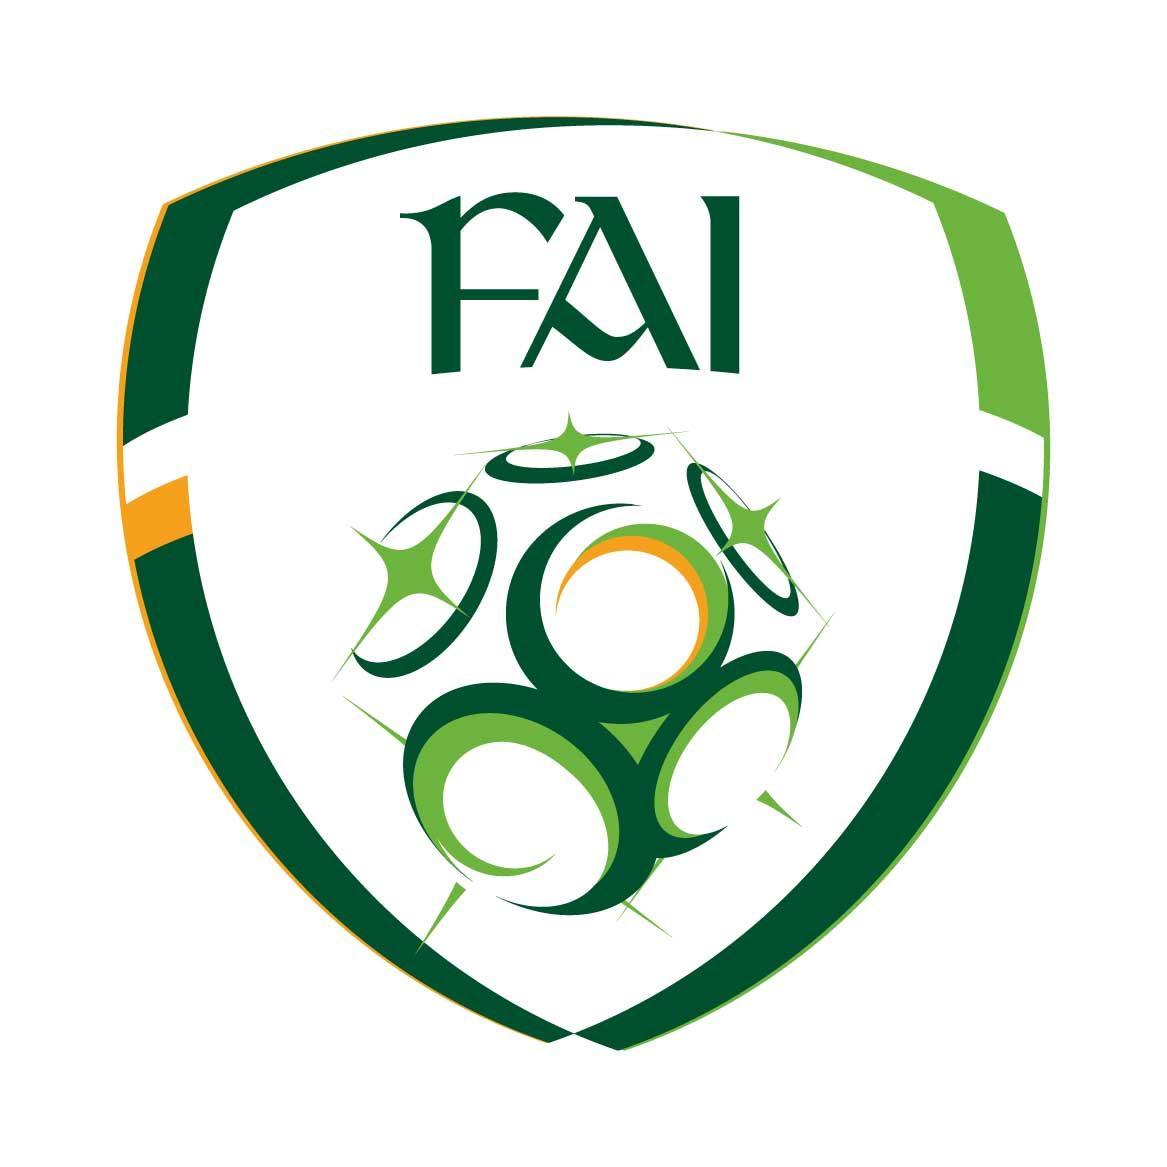 FAI Coach Education- Do Not Change - FAI Admin